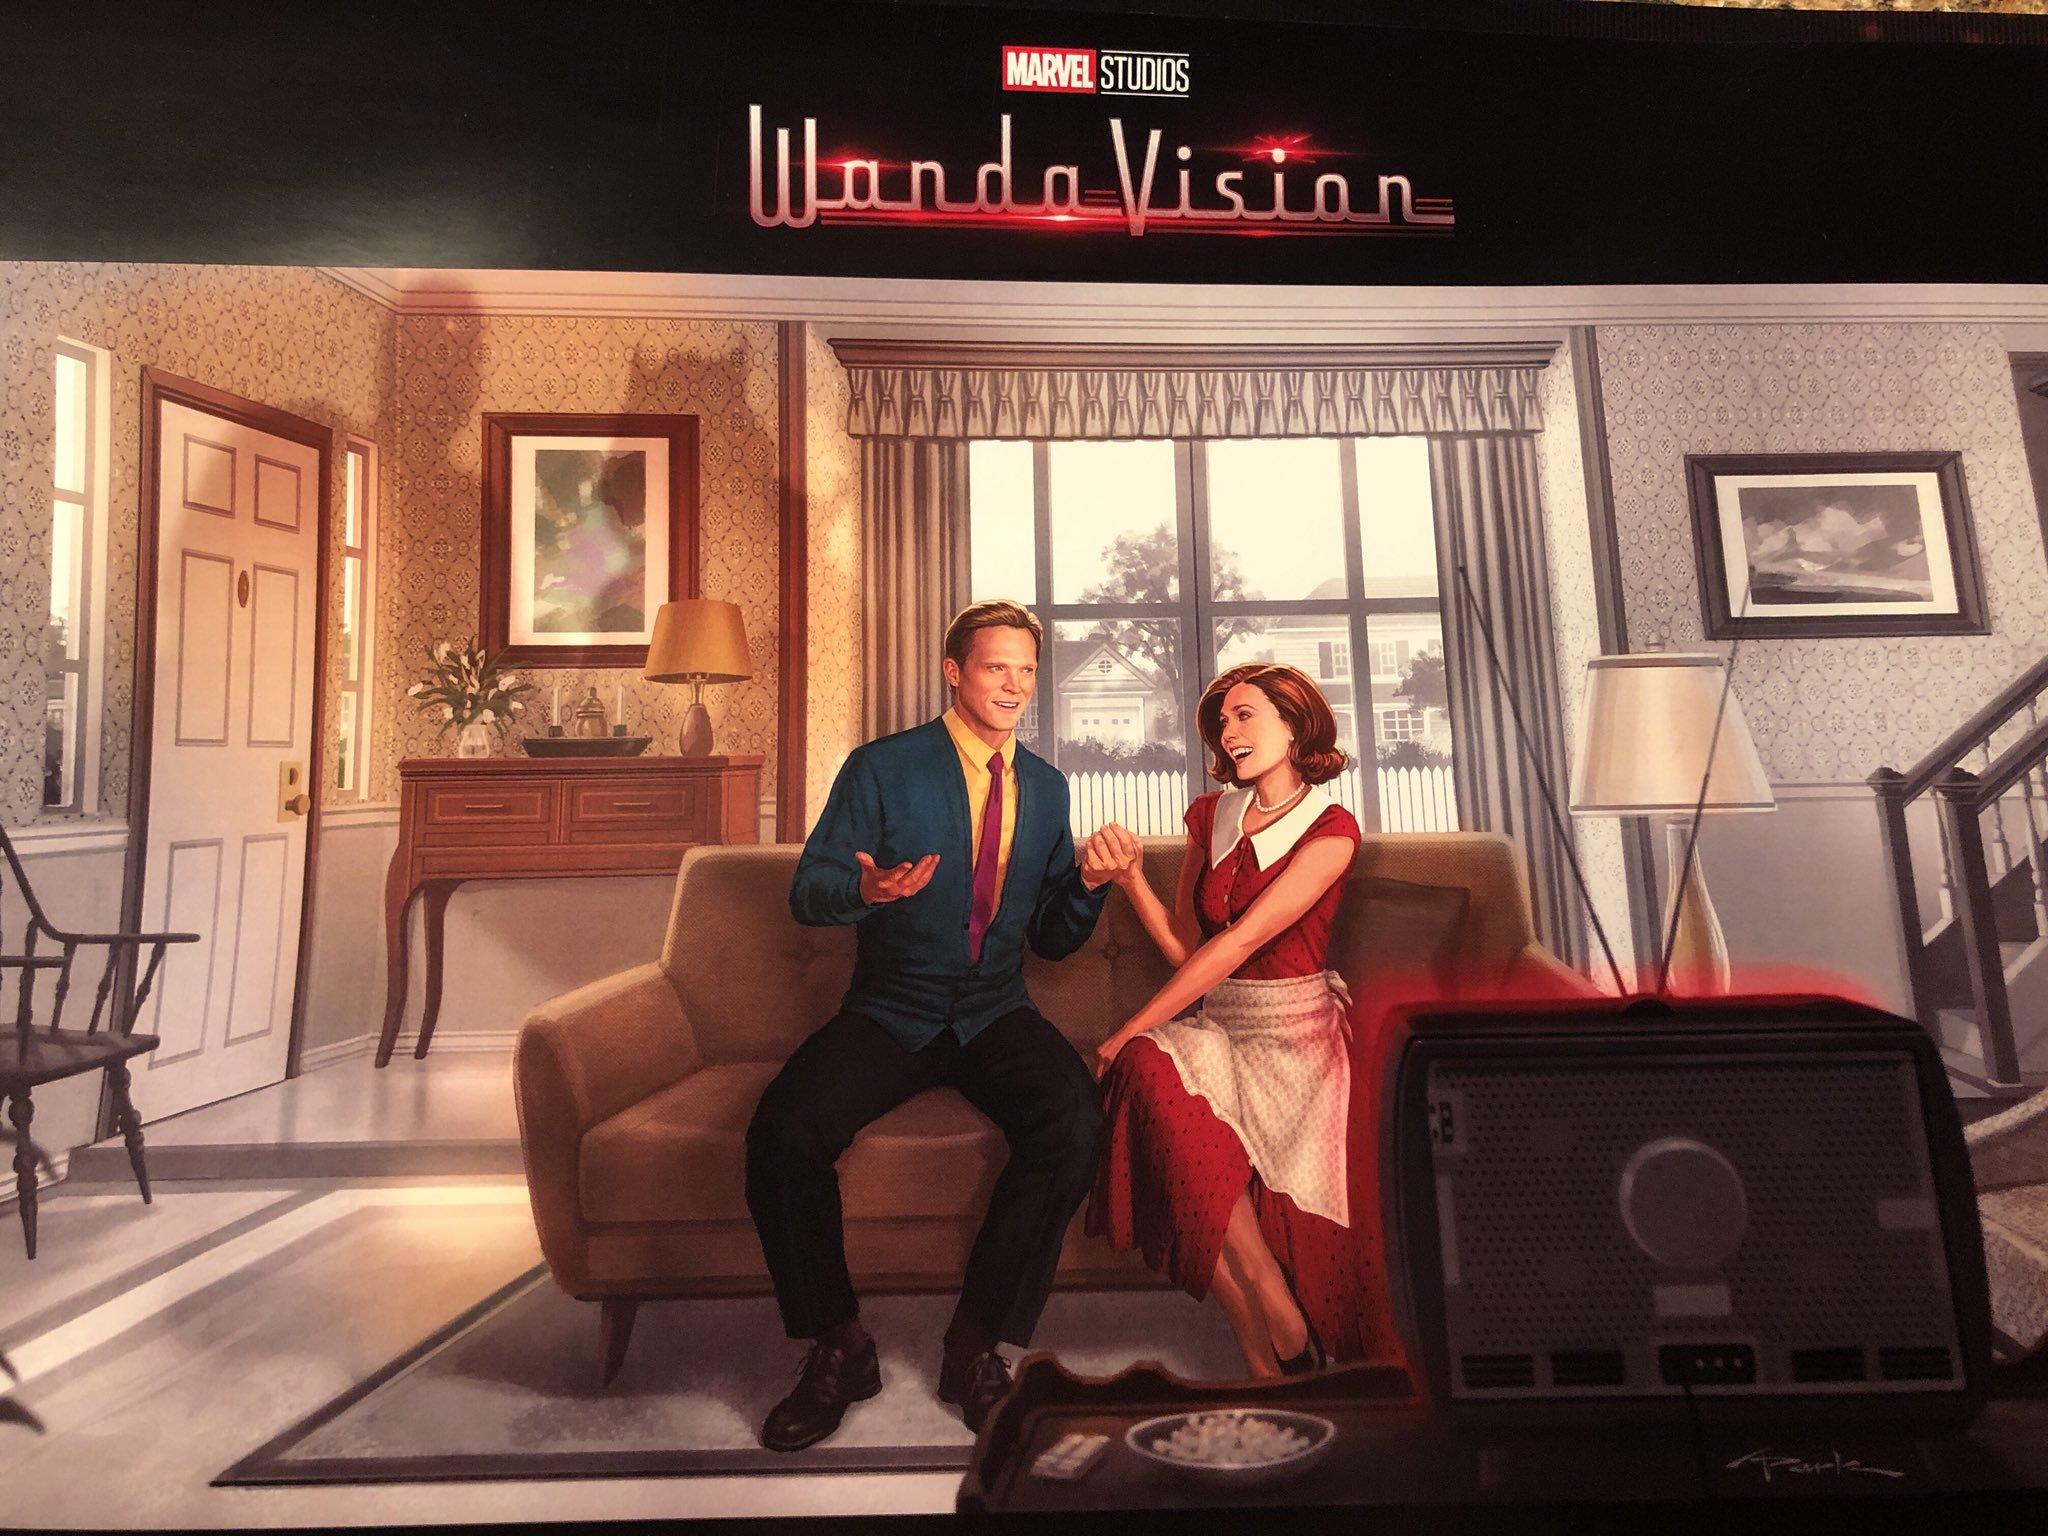 Wanda-Vision-Andy-Park-concept-art